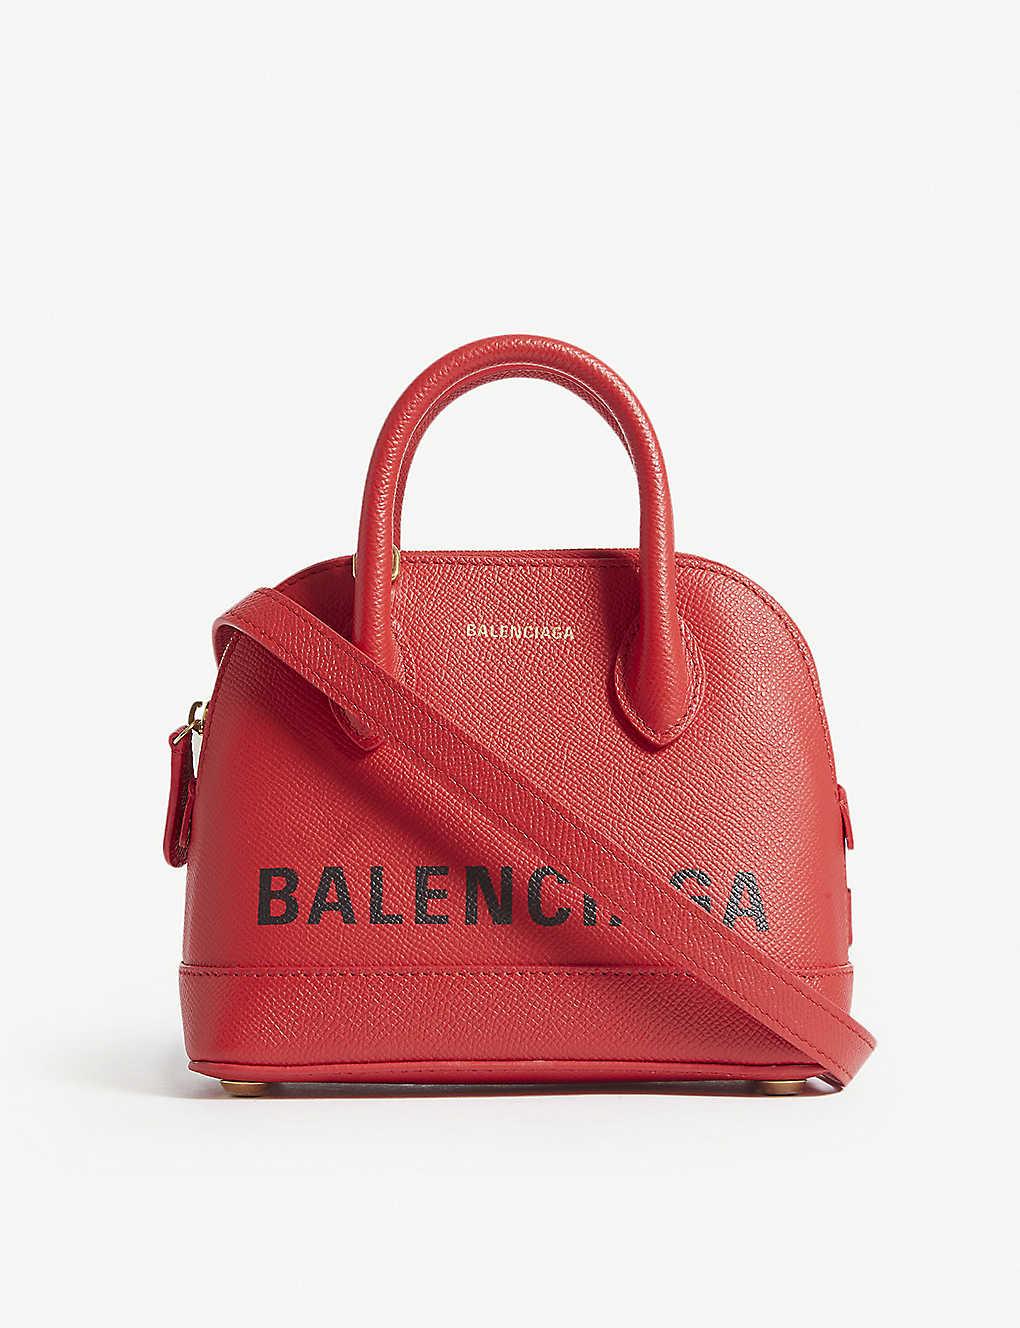 843d8b2b30 BALENCIAGA - Ville Top Handle XXS grained leather tote bag ...